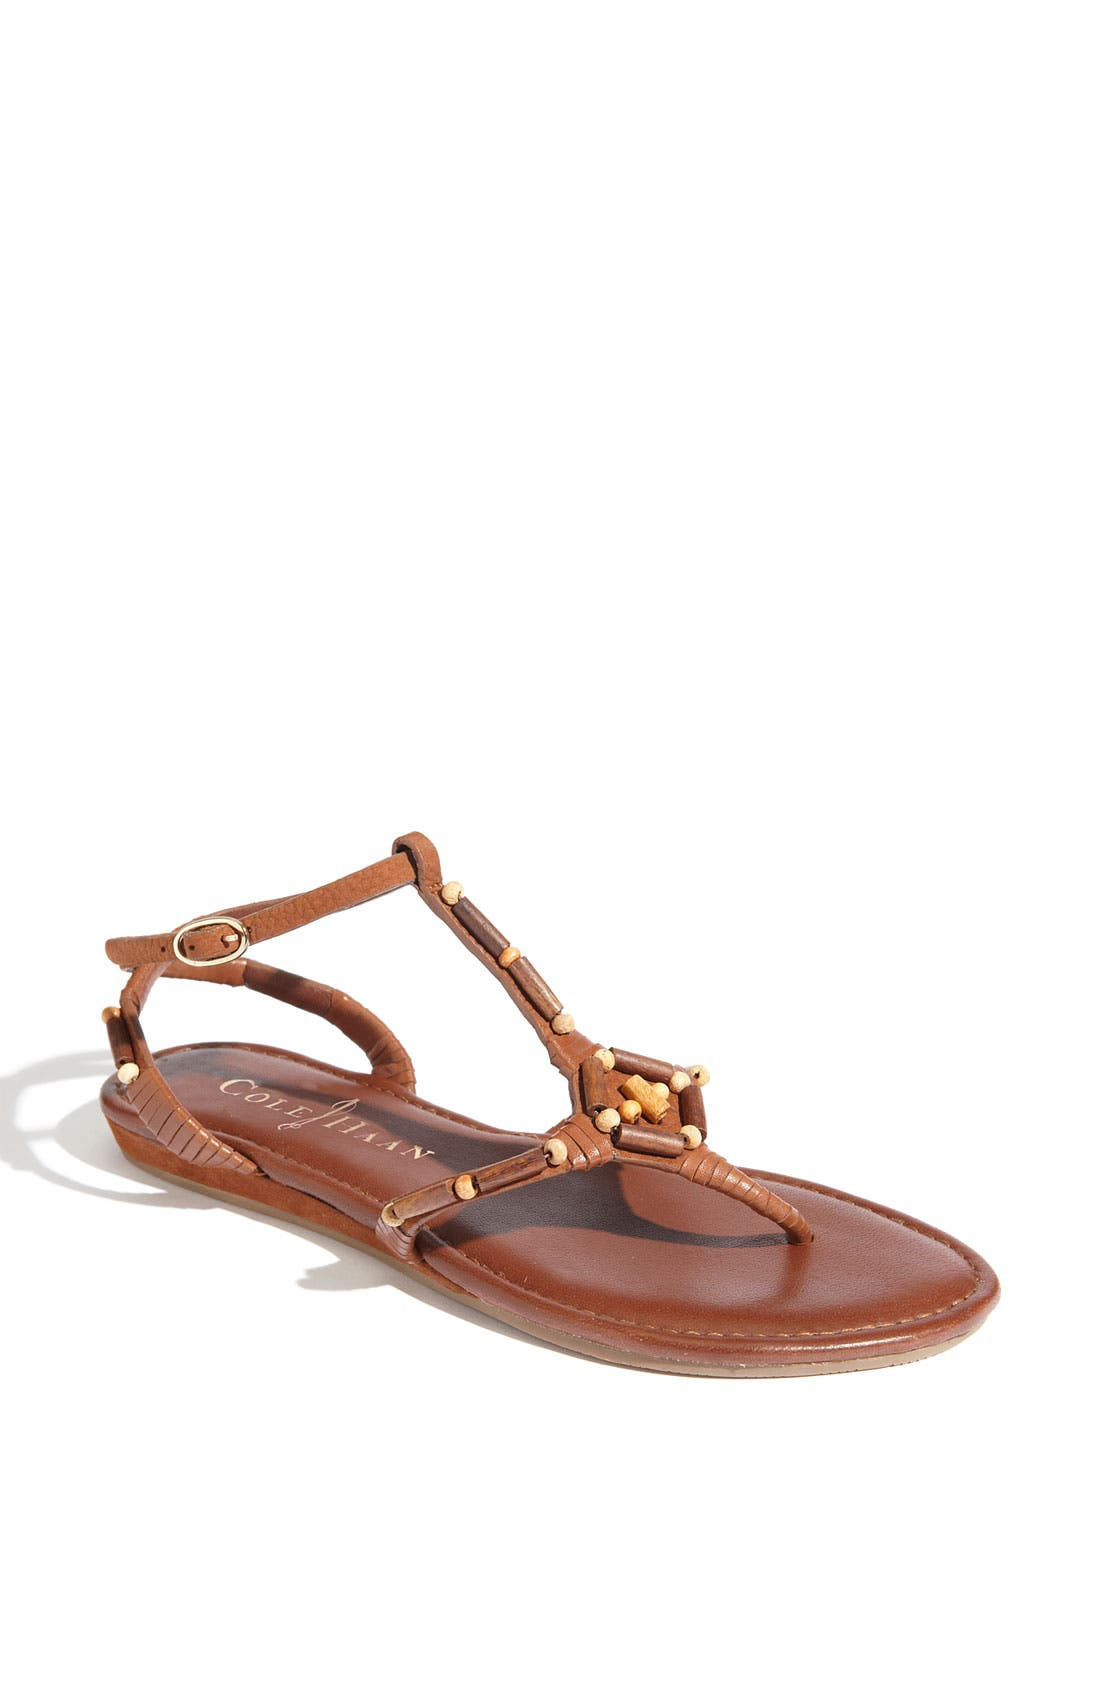 Alternate Image 1 Selected - Cole Haan 'Air Larissa' Sandal